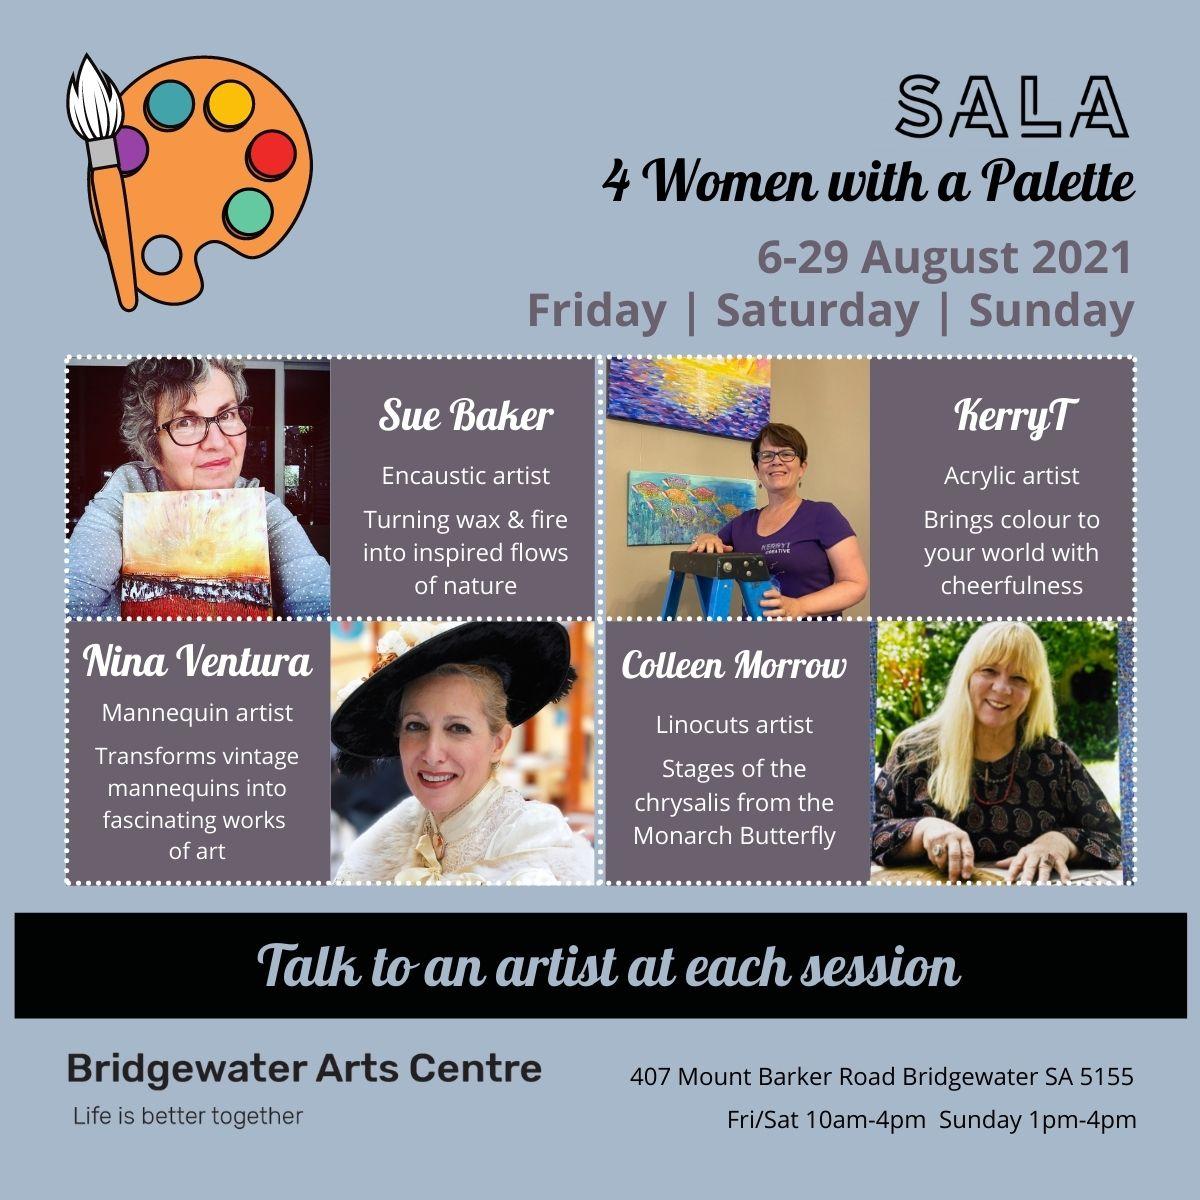 SALA 4 Women with a Palette Bridgewater Arts Centre